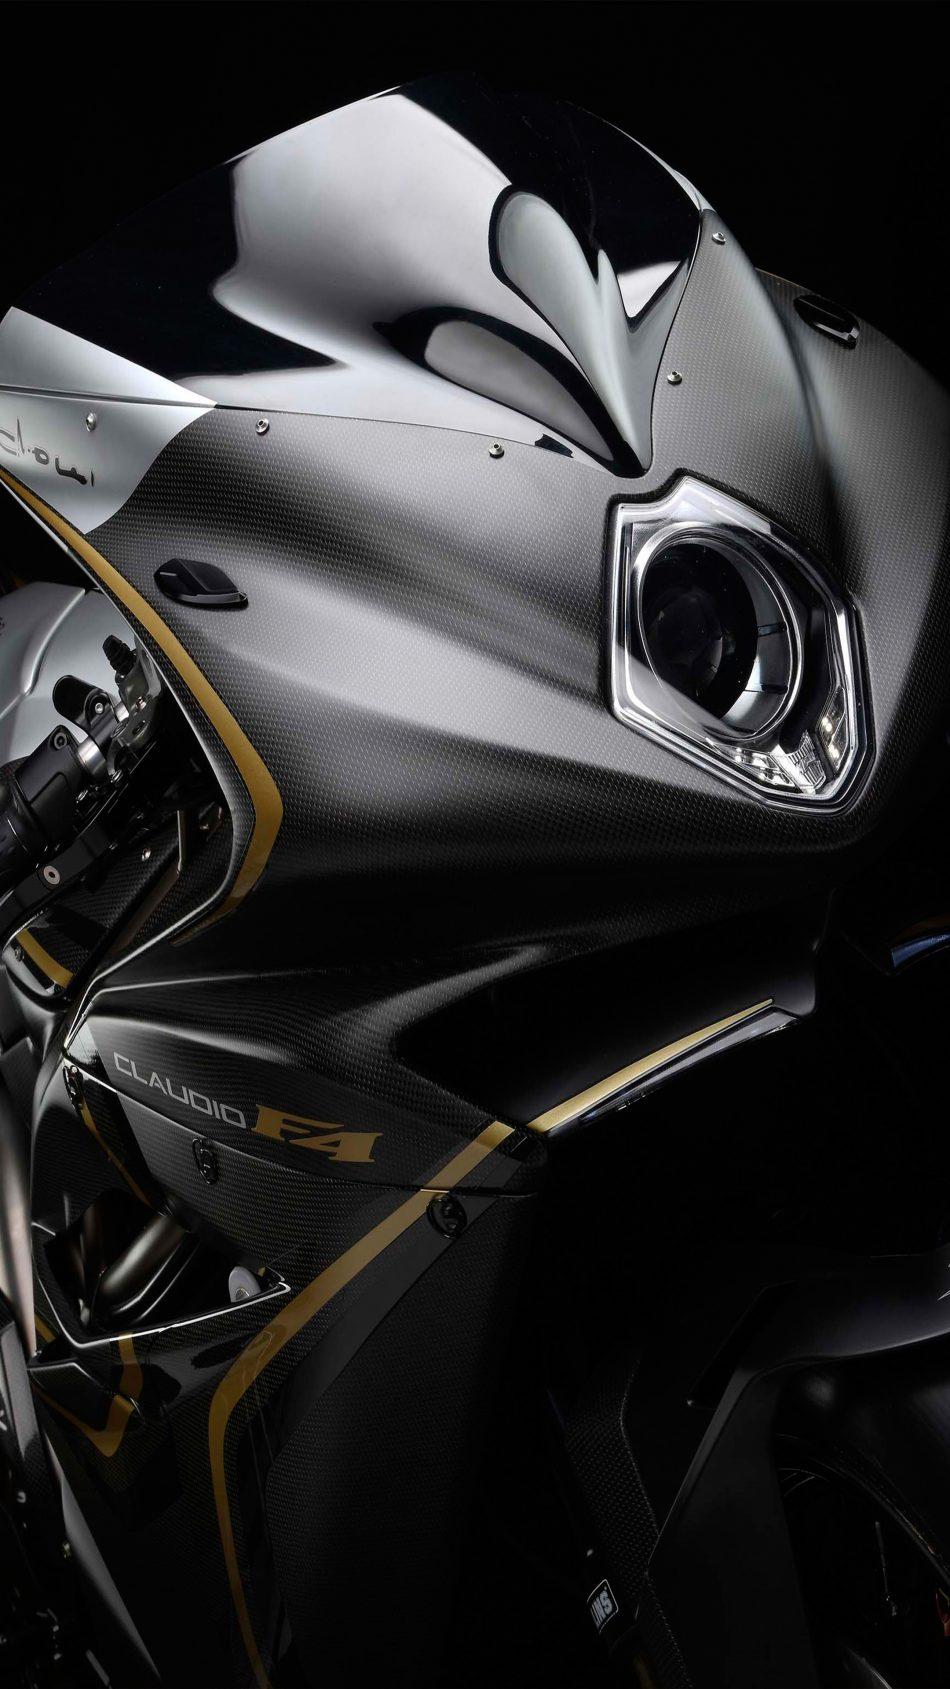 MV Agusta F4 Claudio 2019 4K Ultra HD Mobile Wallpaper